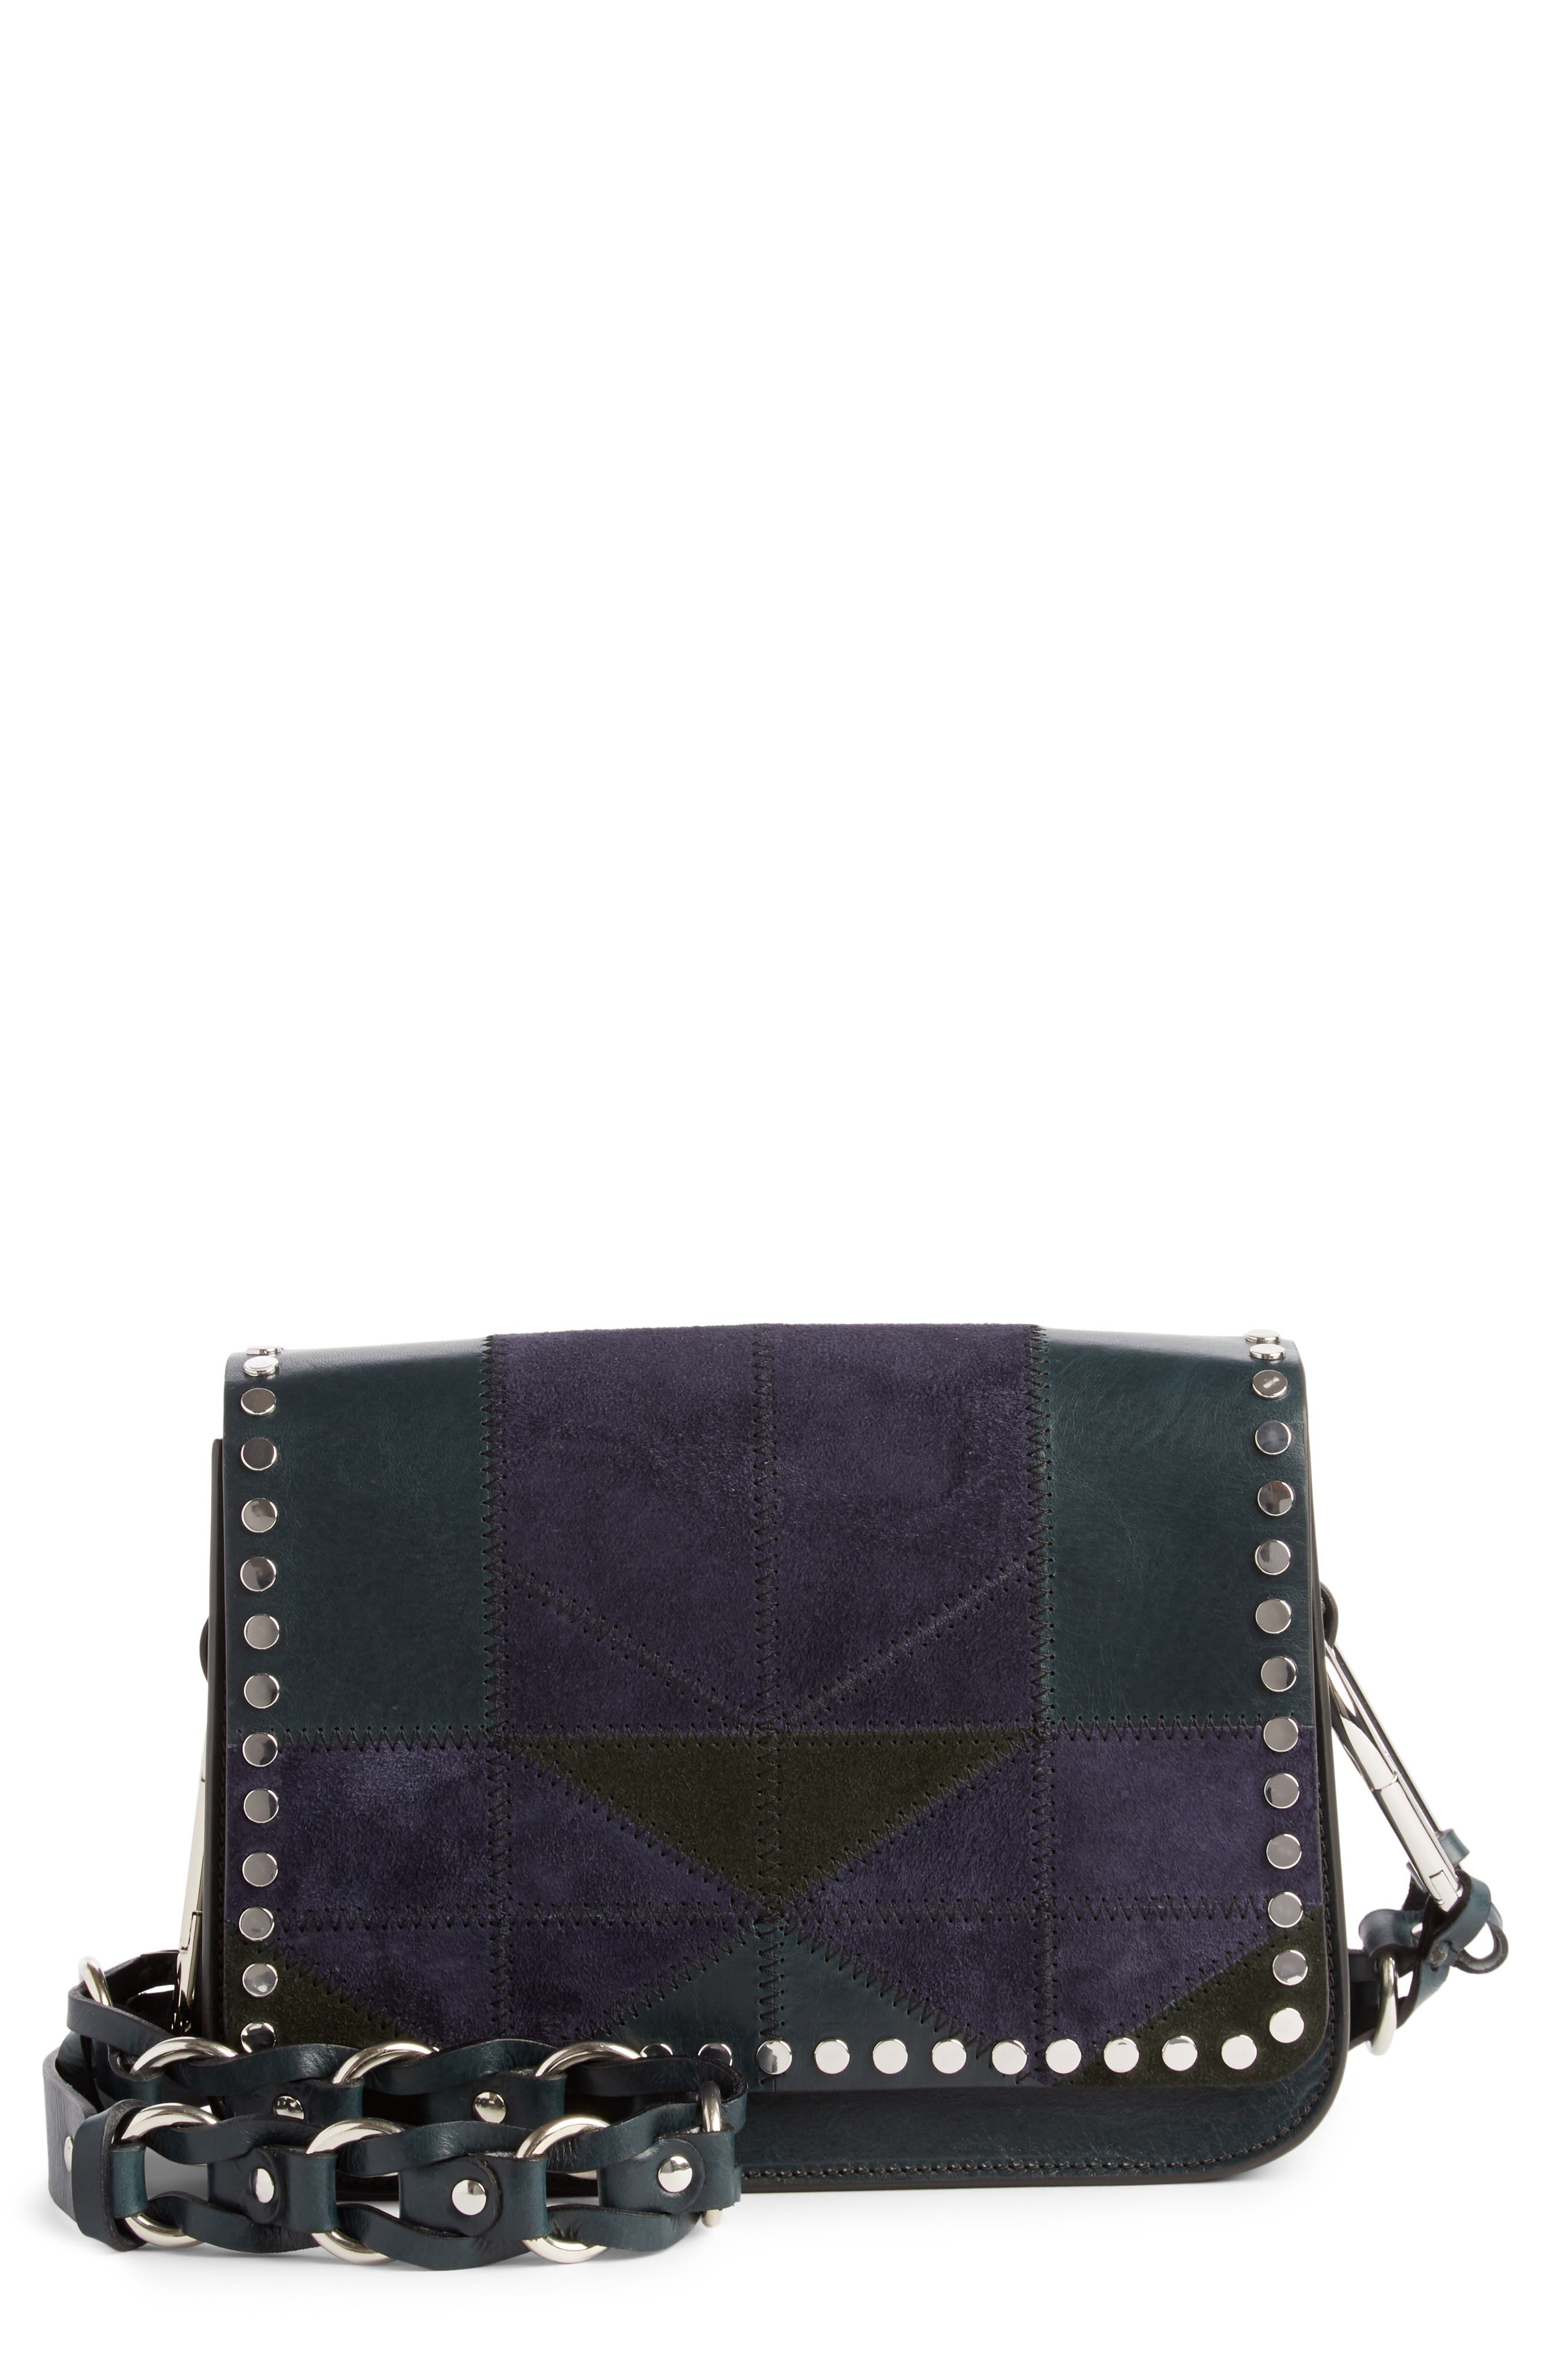 Calibar Patchwork Leather Crossbody Bag,                             Main thumbnail 1, color,                             Petrol